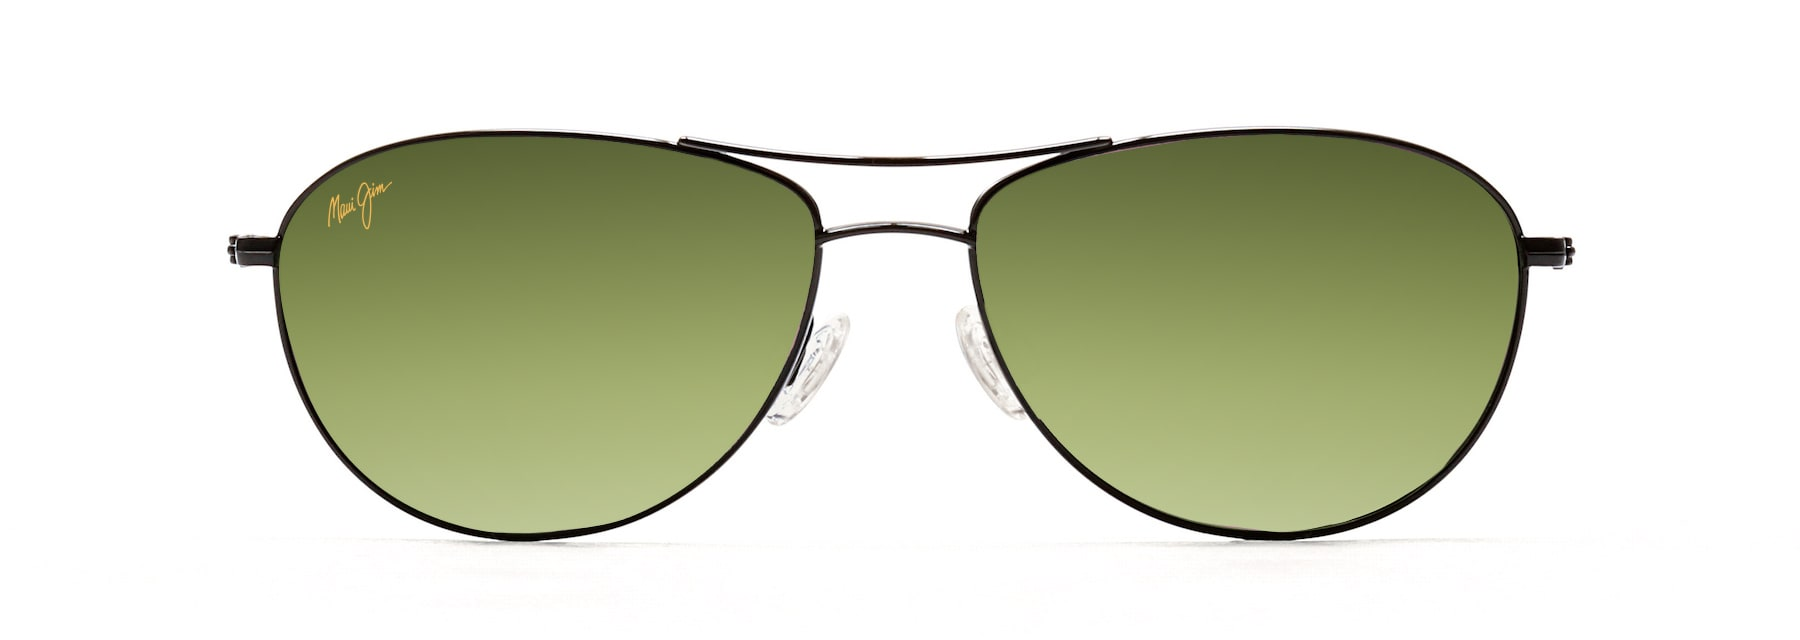 c751ff75accc Baby Beach Polarised Sunglasses | Maui Jim®